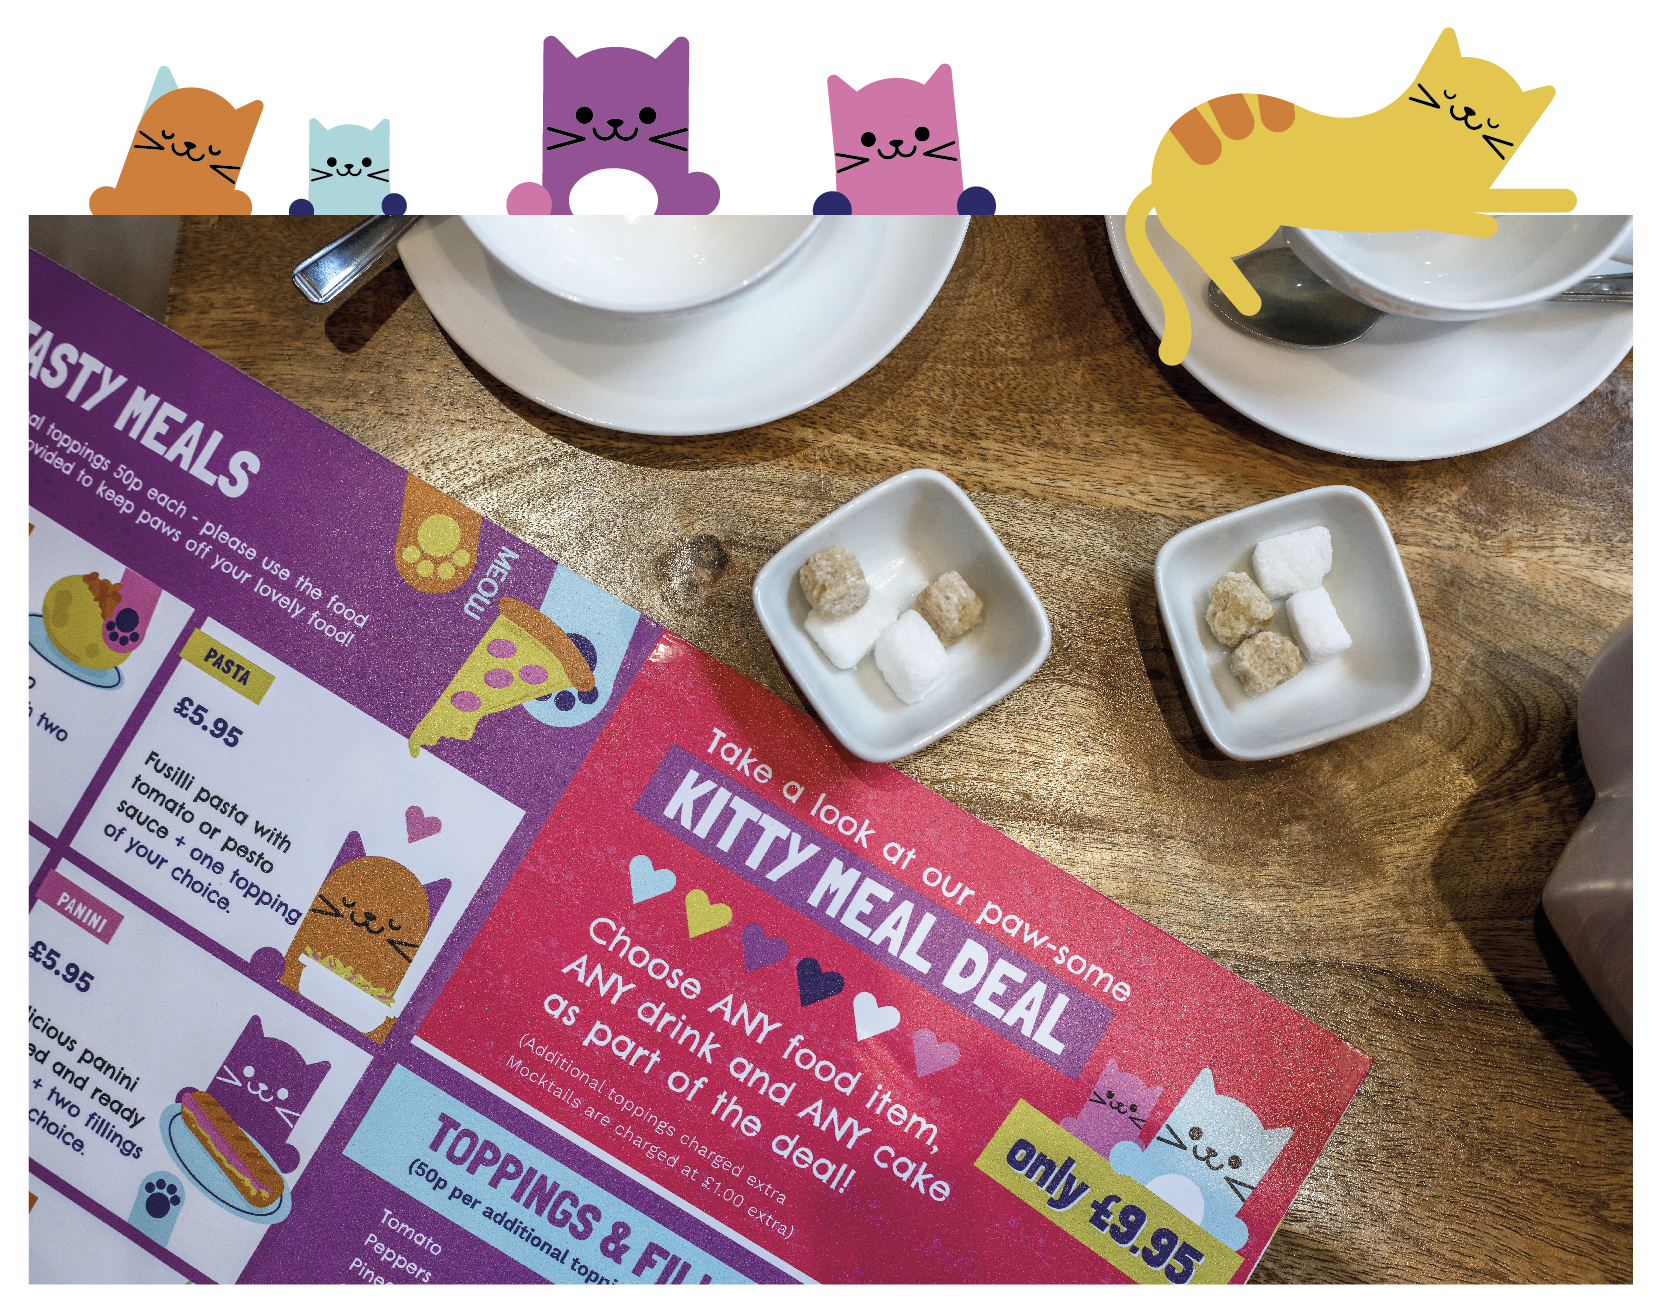 jess-bright-design-kitty-cafe-branding.png